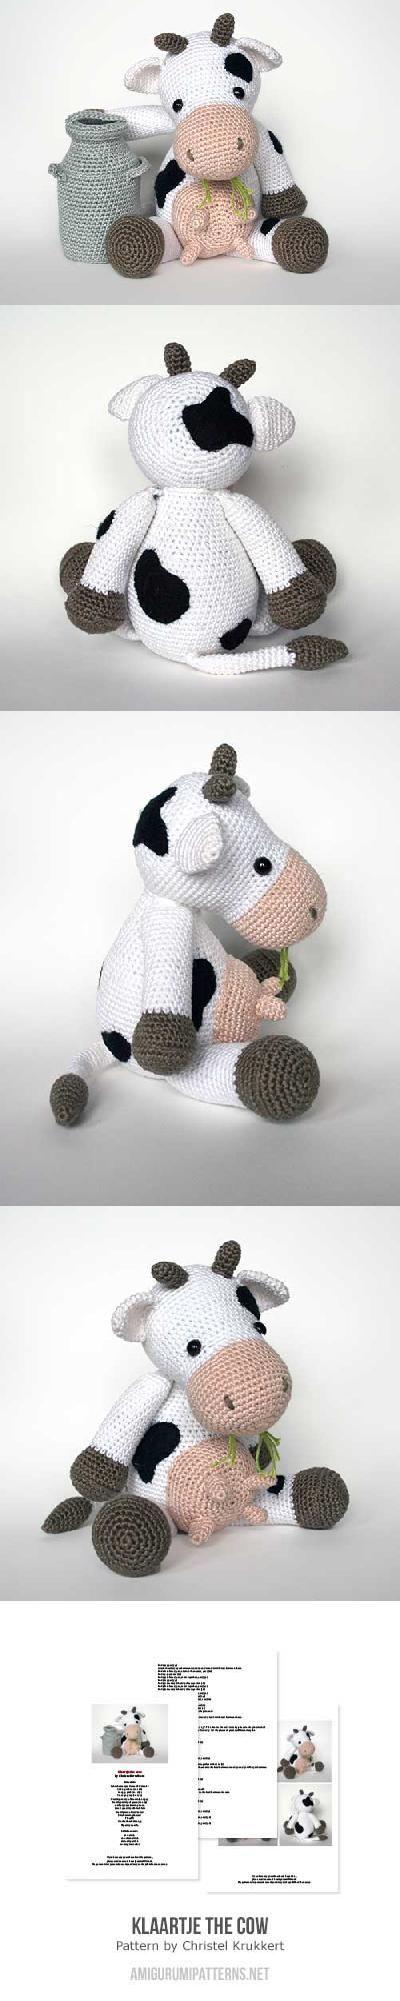 Klaartje The Cow Amigurumi Pattern …